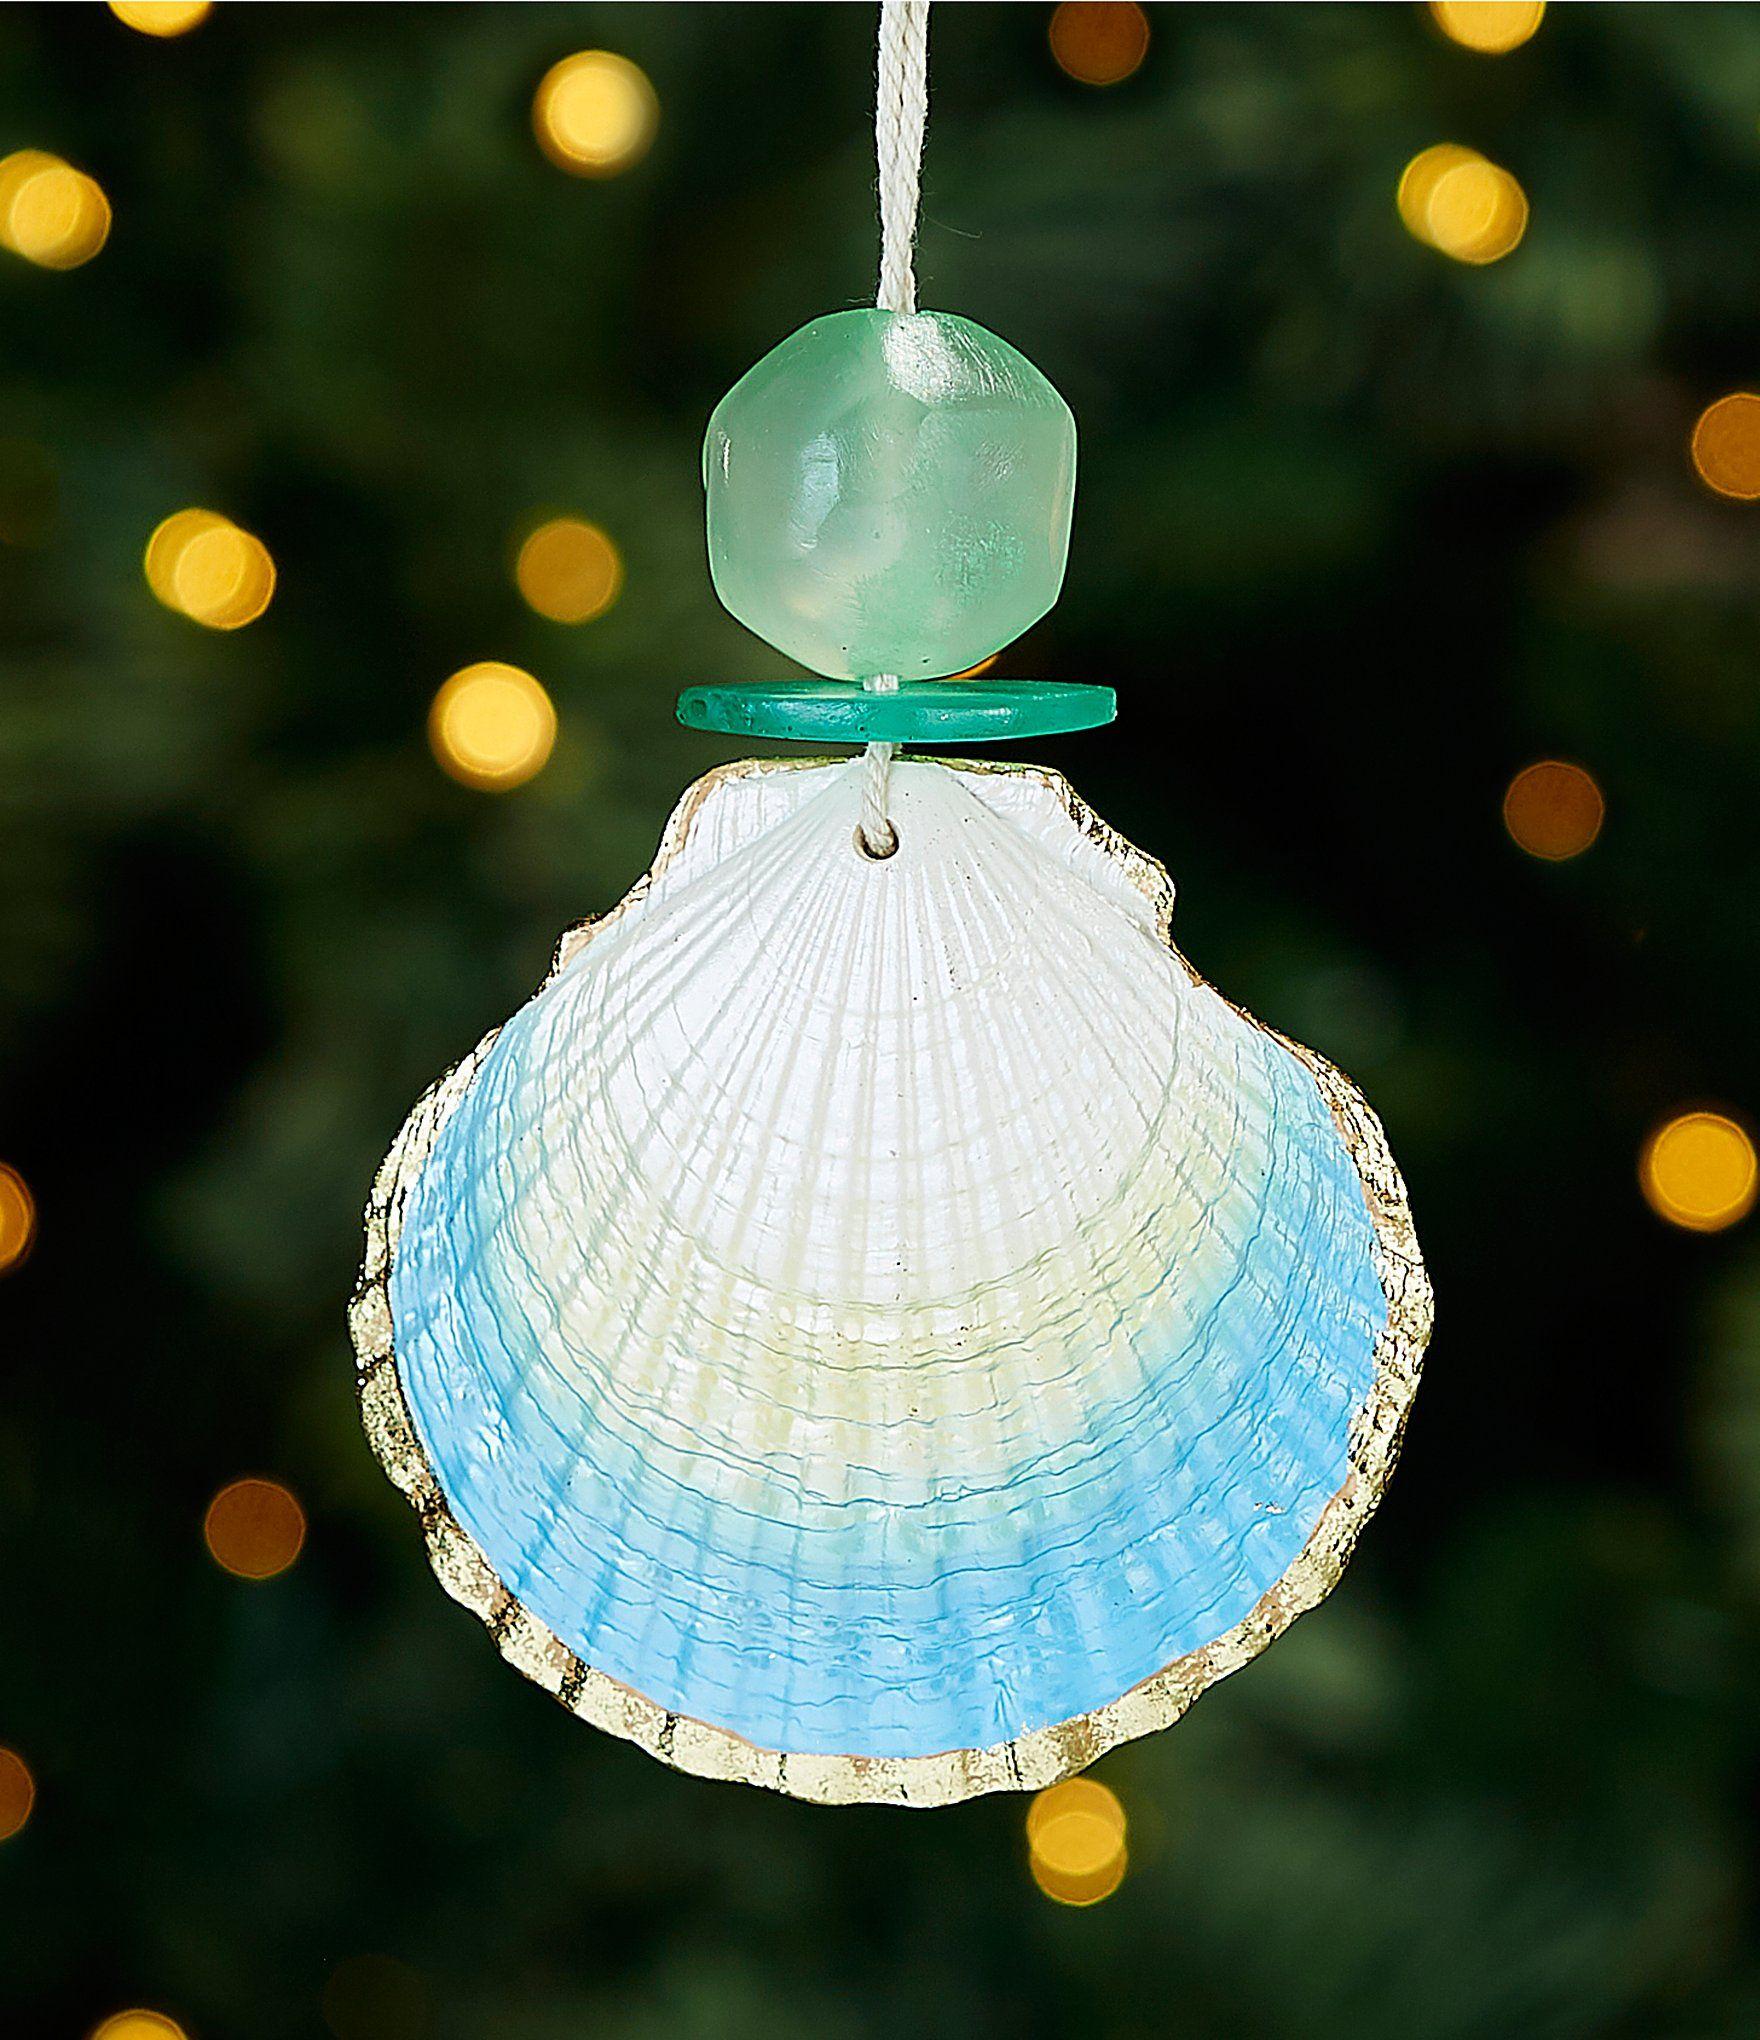 Trimsetter Sea Shells Jingle Bells Clam Shell Ornament Dillard S In 2020 Beach Christmas Decorations Ornaments Christmas Ornaments